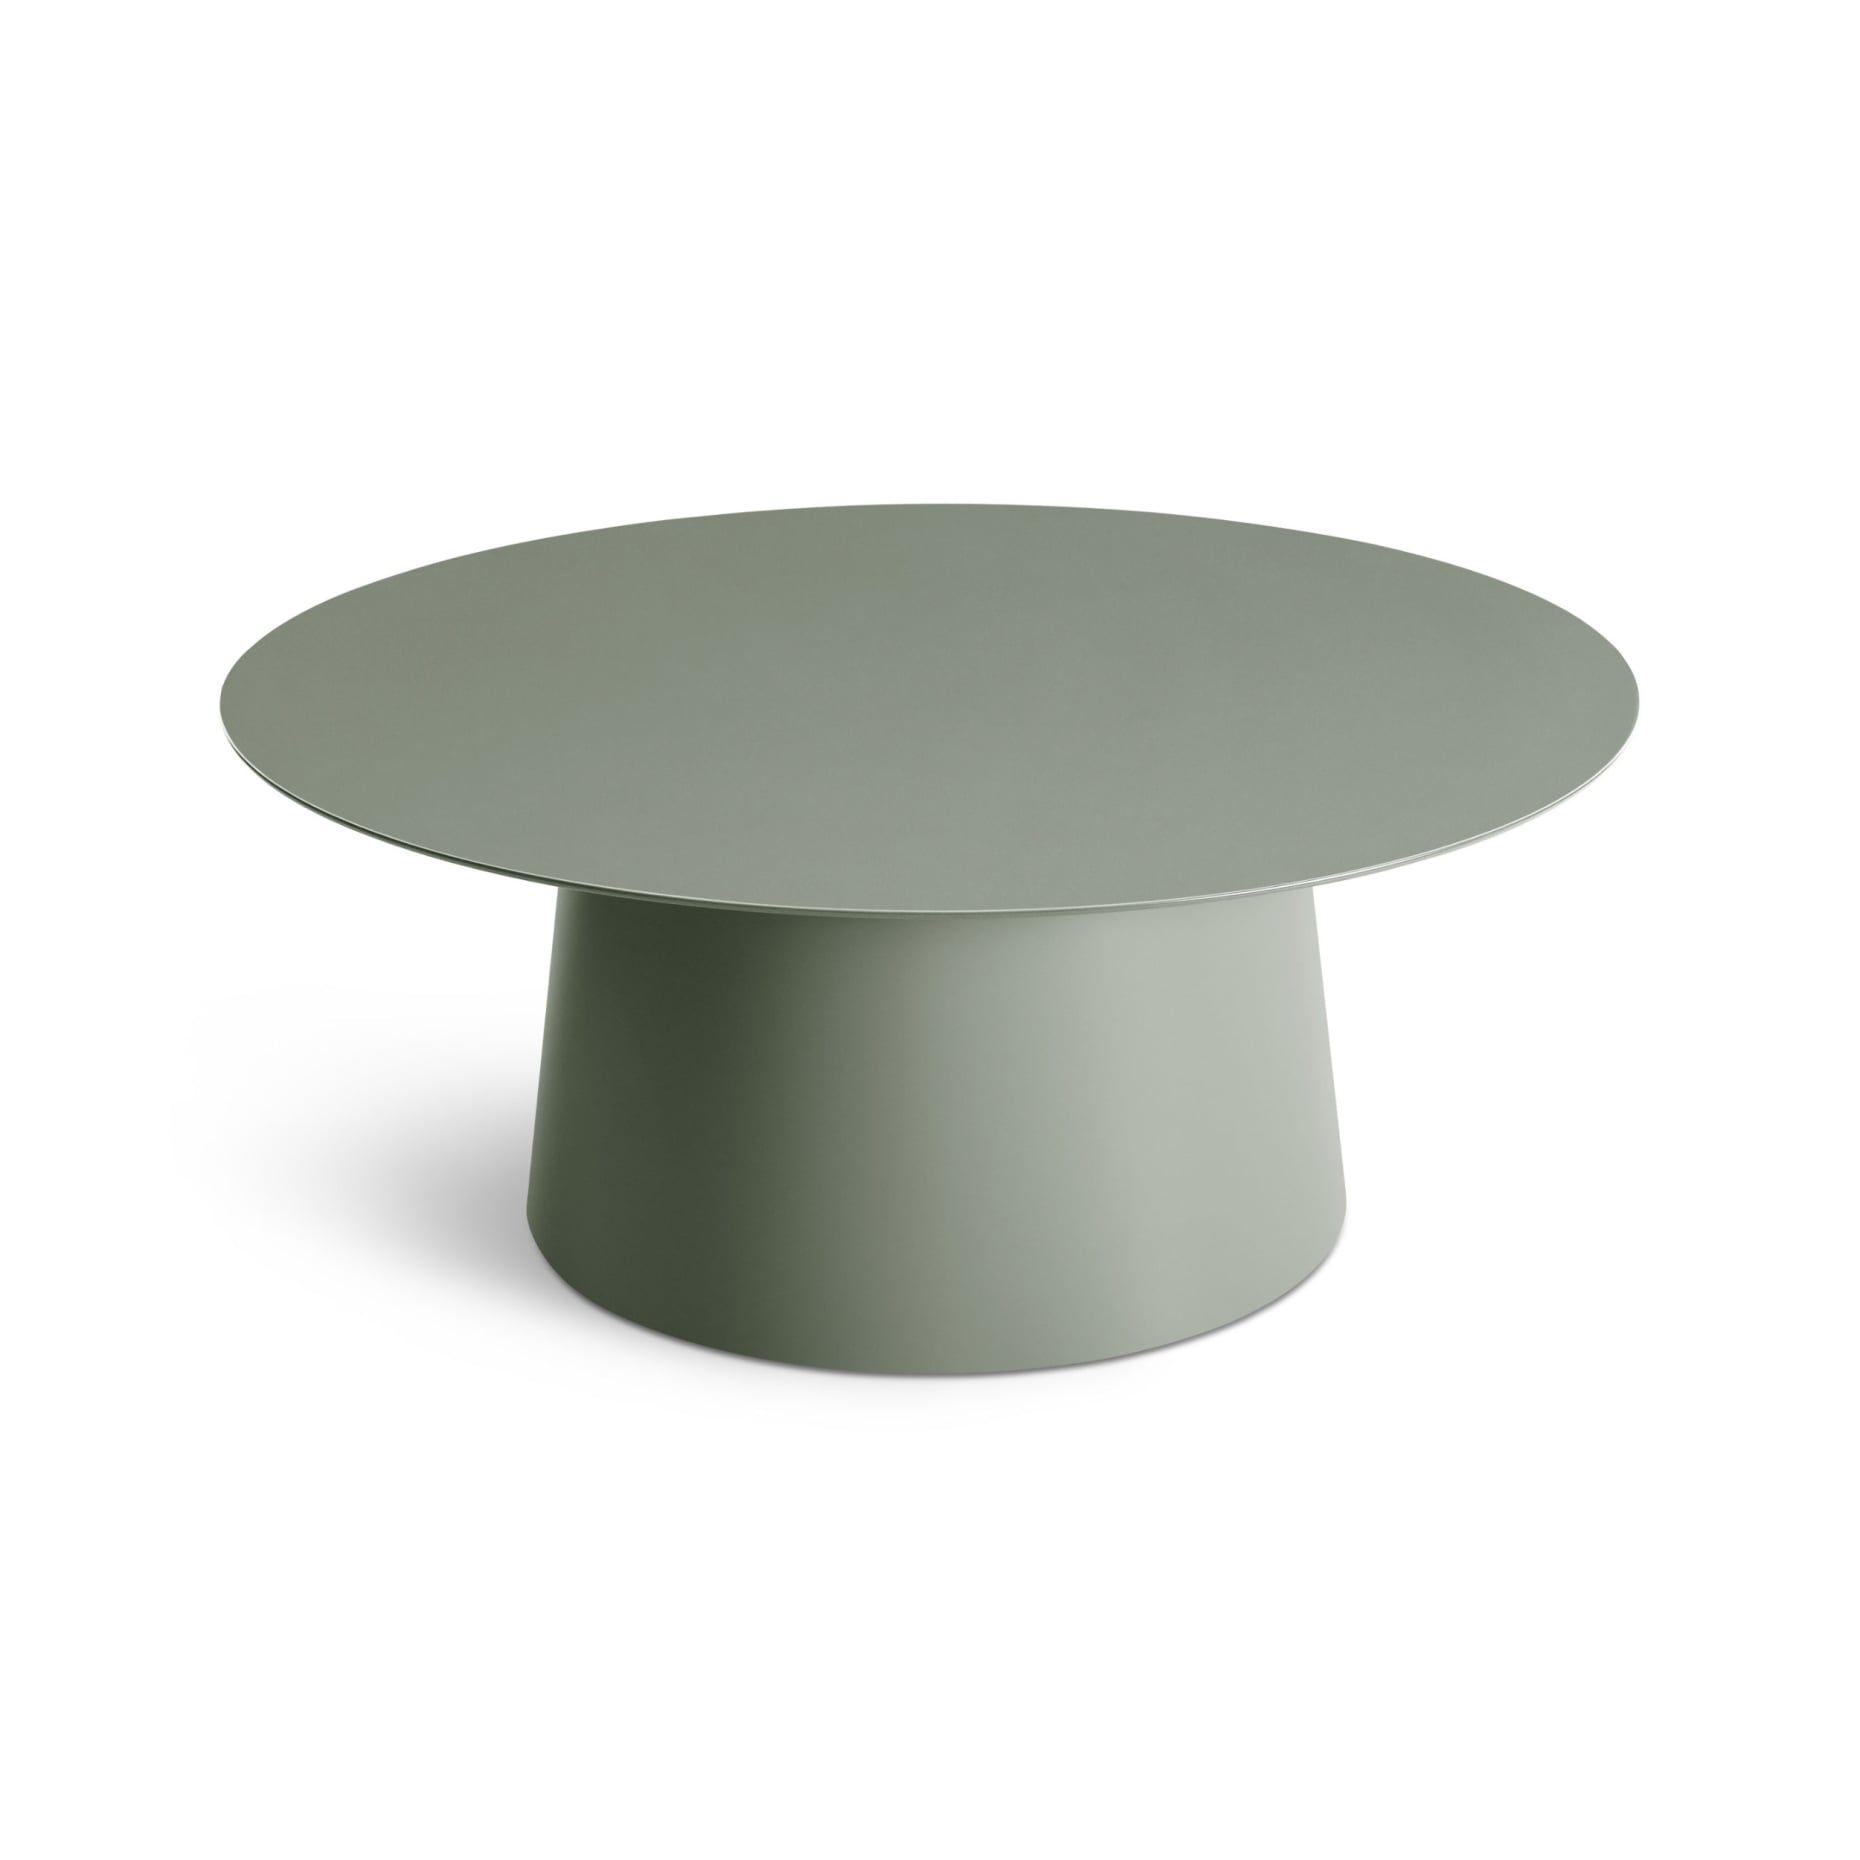 Circula Small Coffee Table Small Coffee Table Chic Coffee Table Round Coffee Table Modern [ 1860 x 1860 Pixel ]